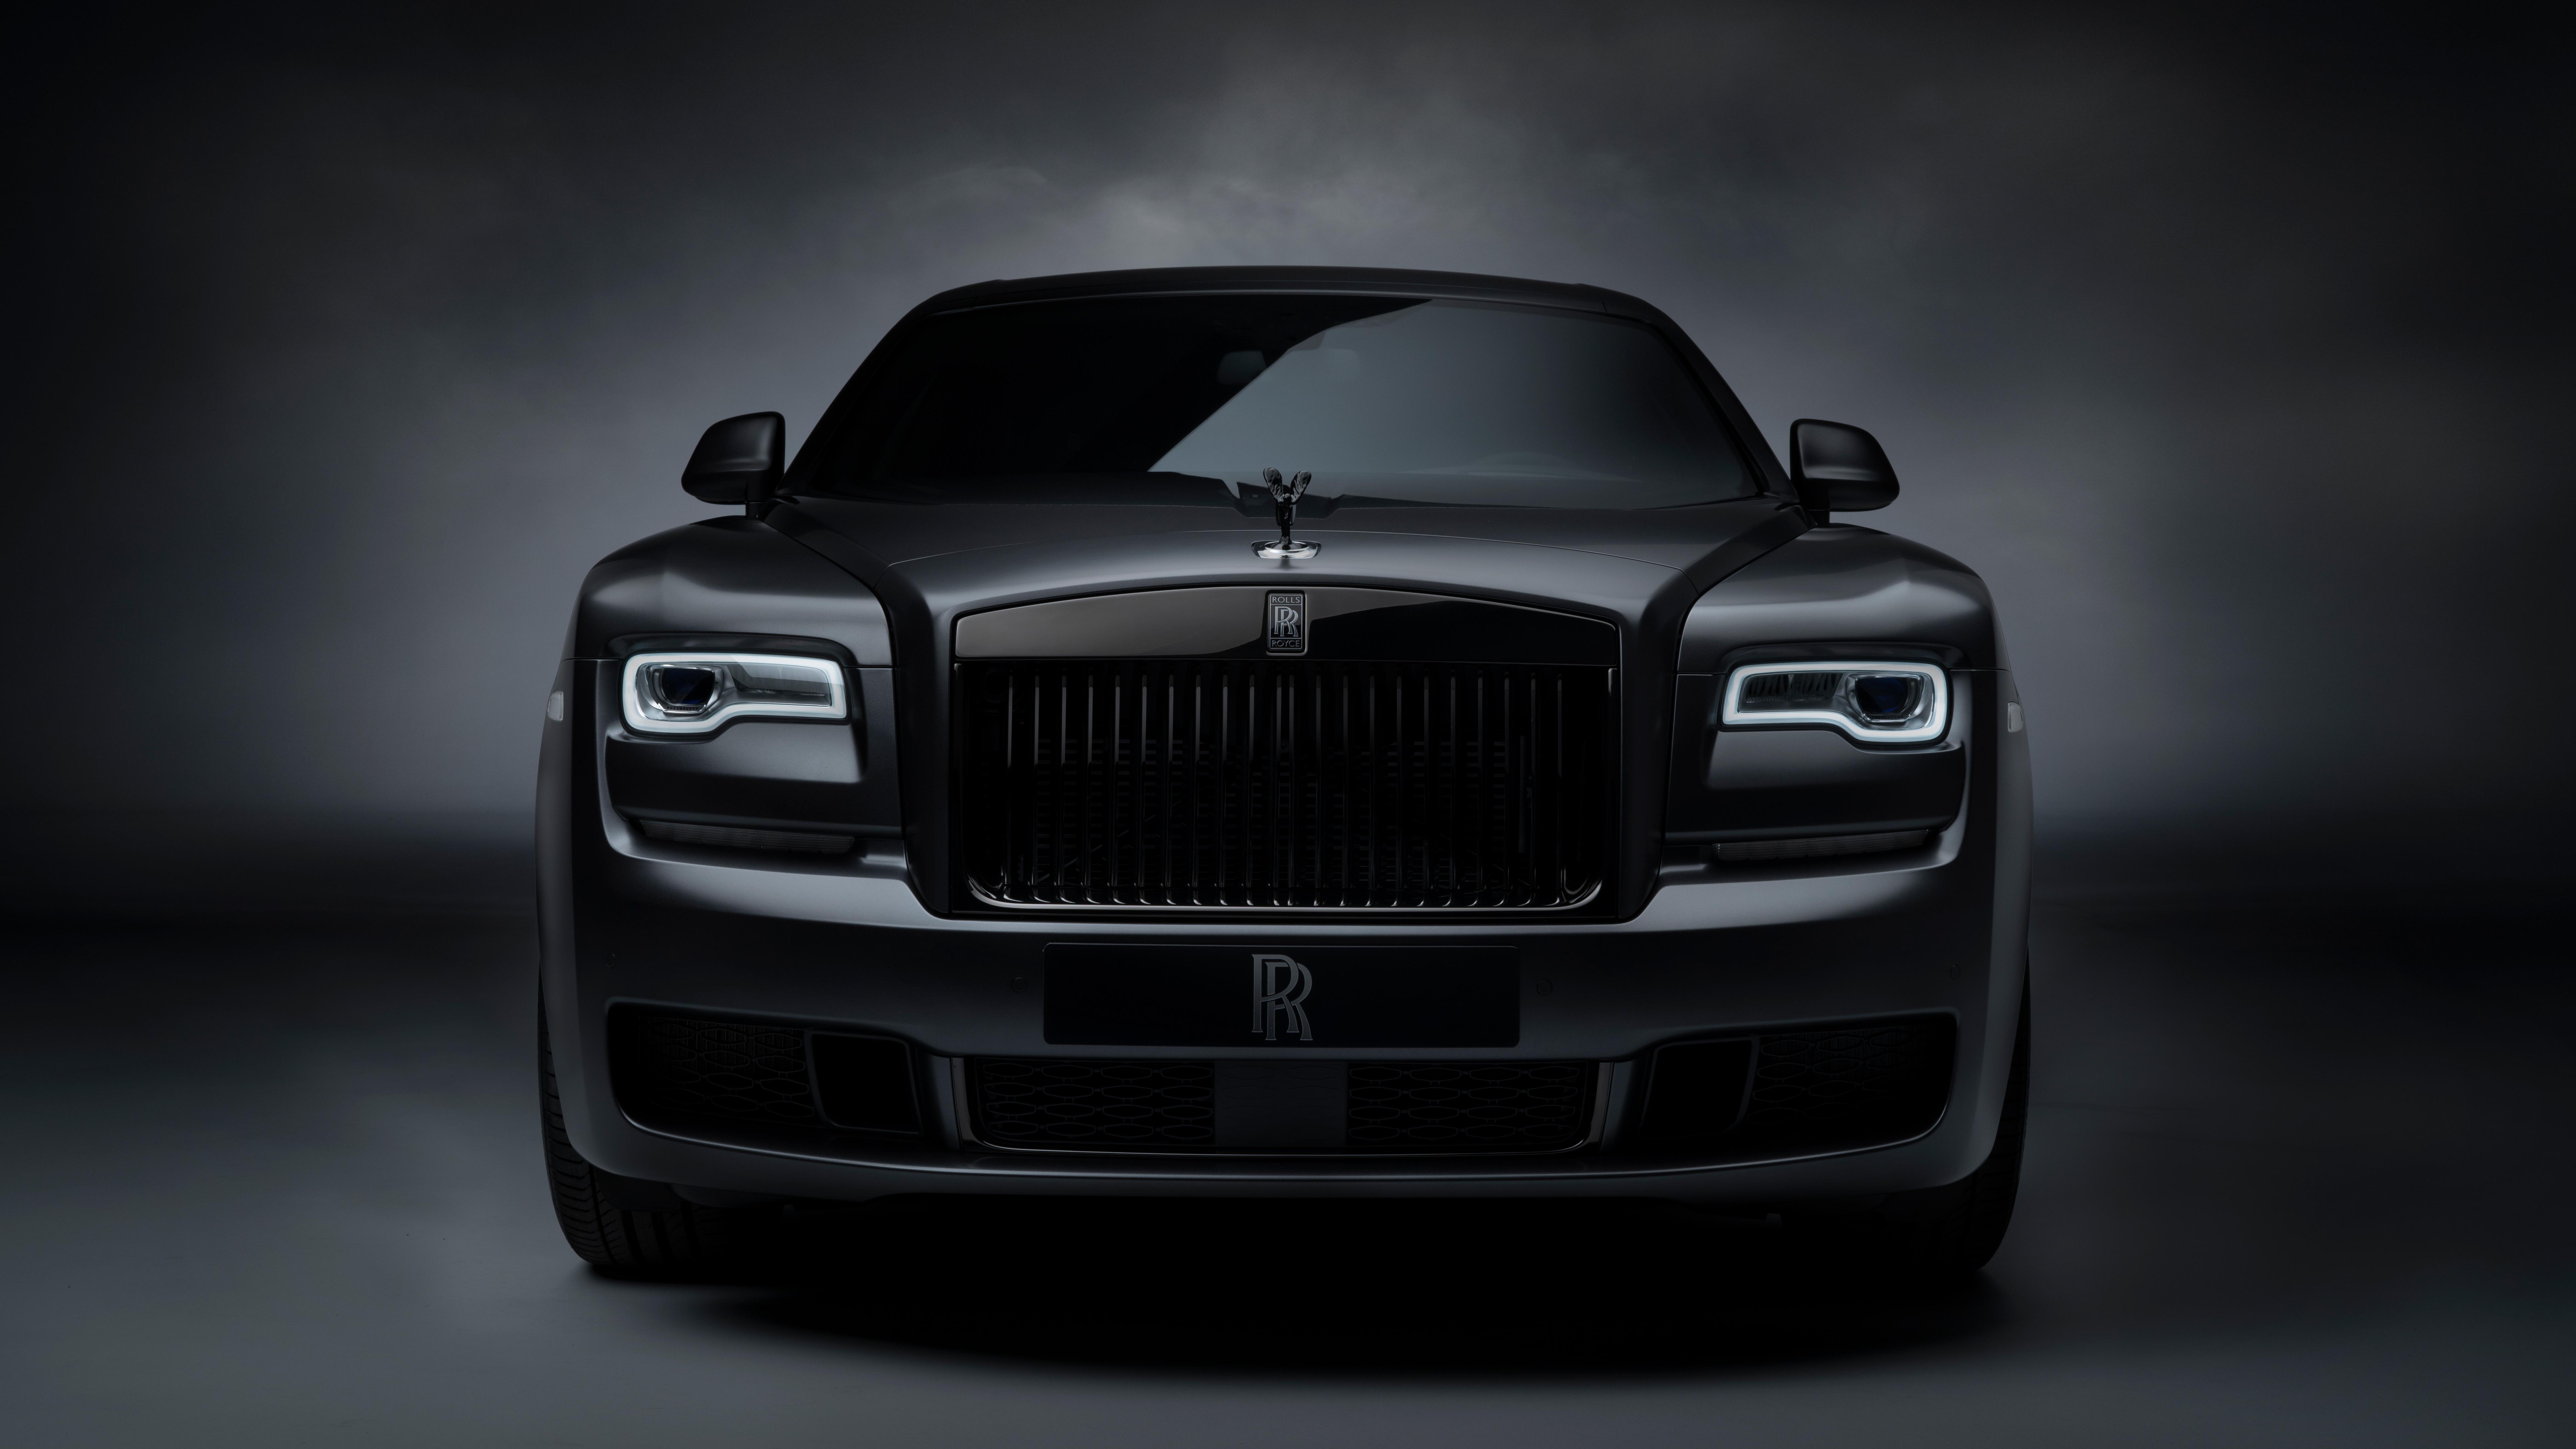 Rolls Royce Ghost Black Badge 2019 Front, HD Cars, 4k ...